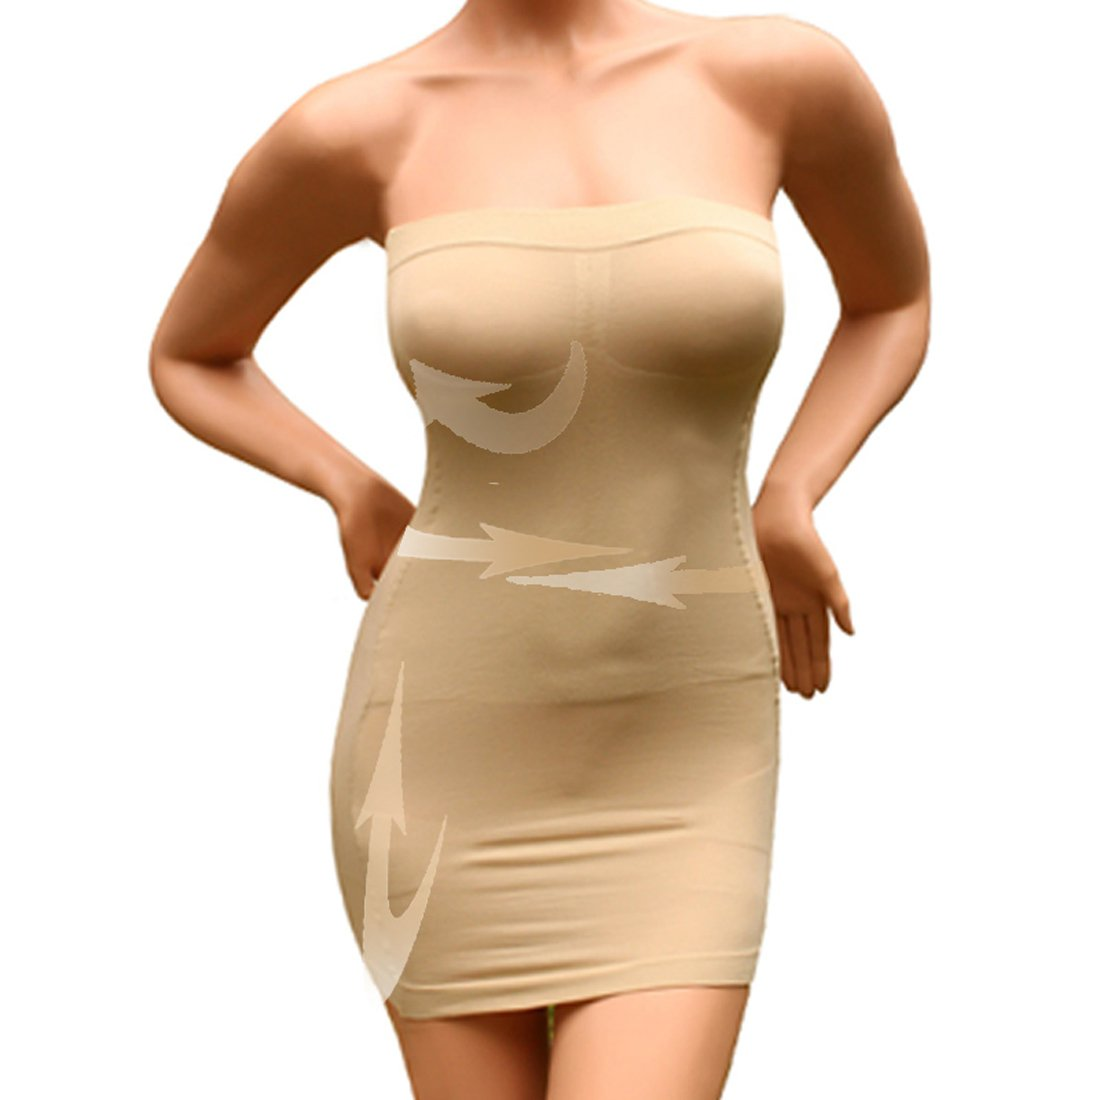 71d531318f54 Amazon.com: Andux Sexy Slimming Tube Top Stretch Strapless Slip Mini Dress  SS-W03 Beige: Sports & Outdoors